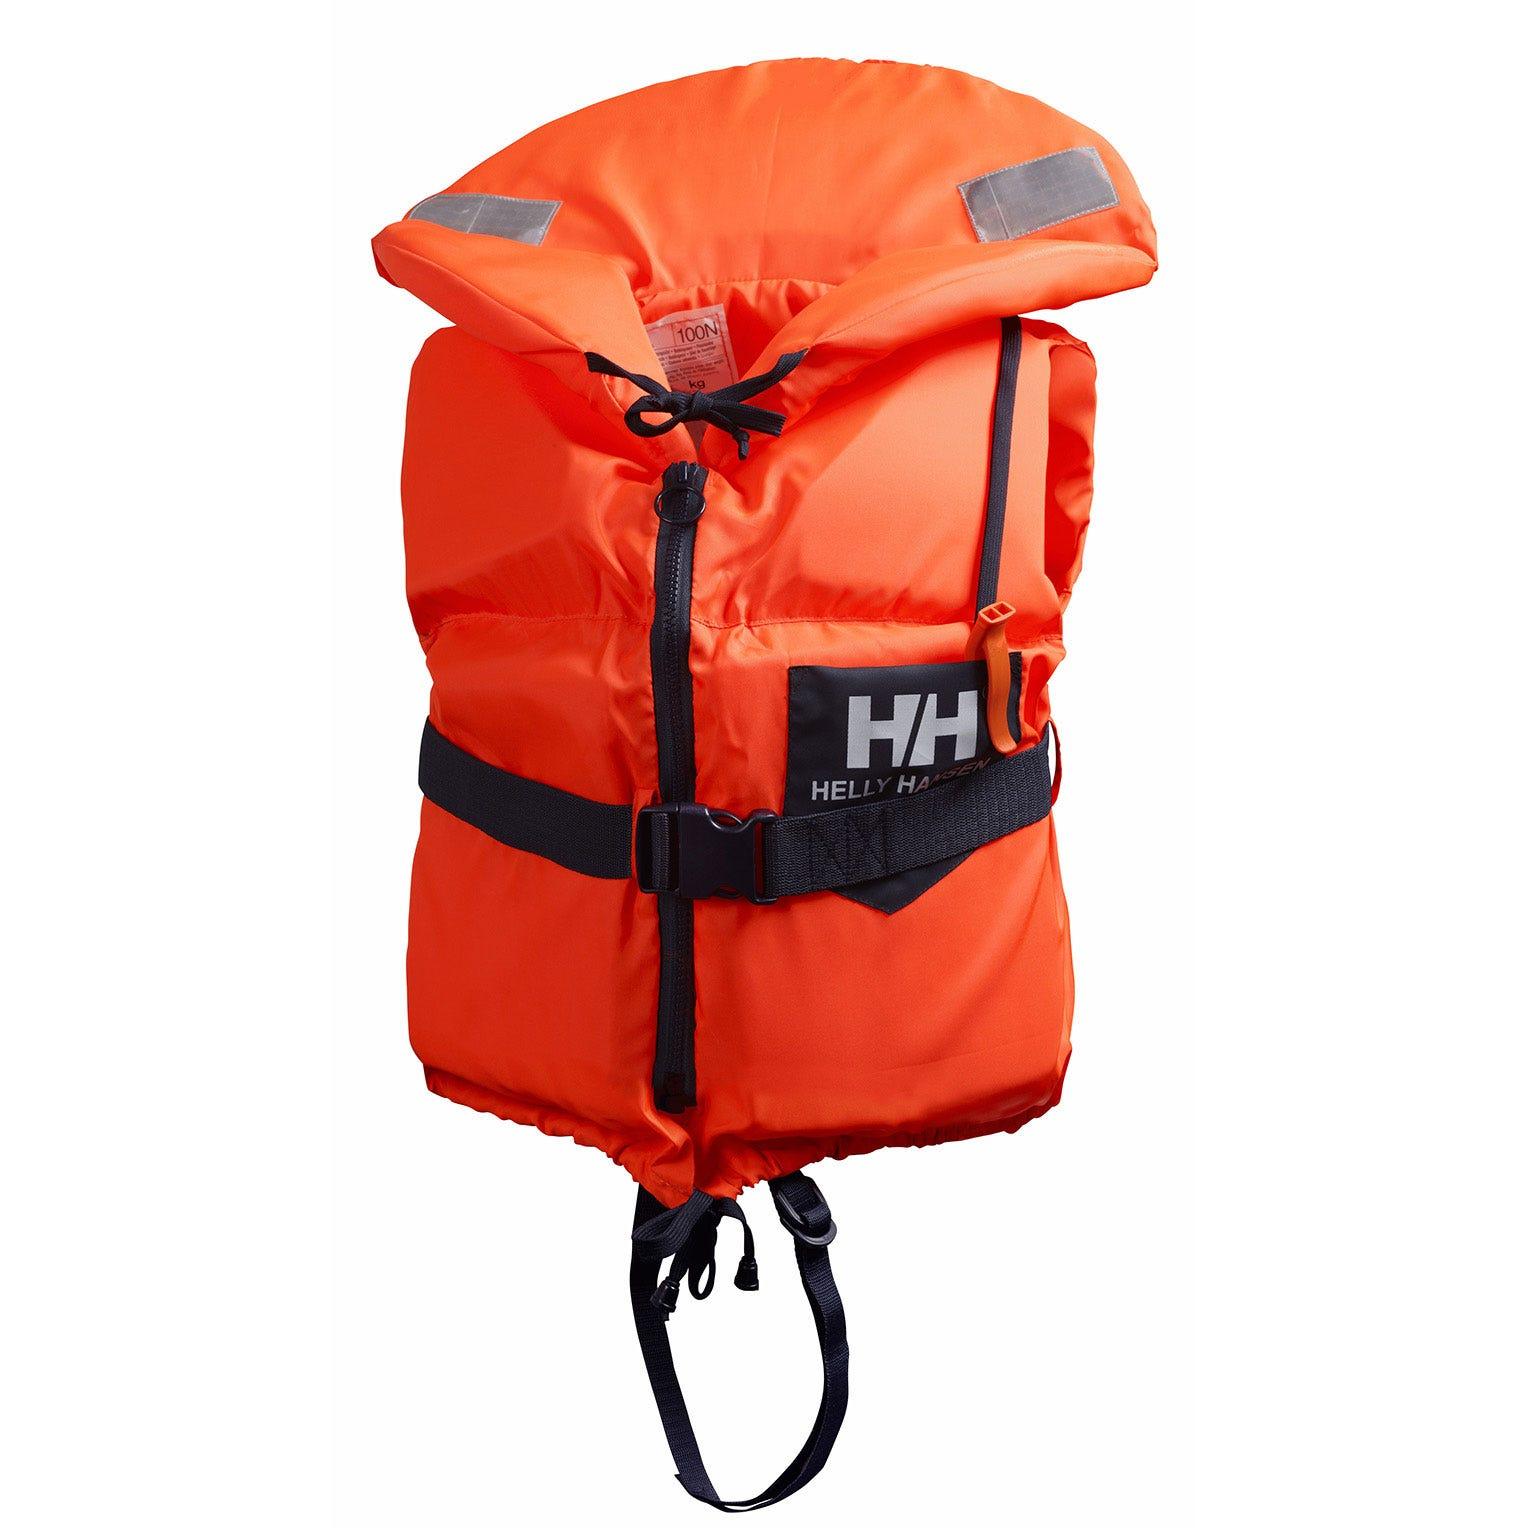 Helly Hansen Unisex W Navigare Scan Sailing Life Jacket Orange 30/40KG